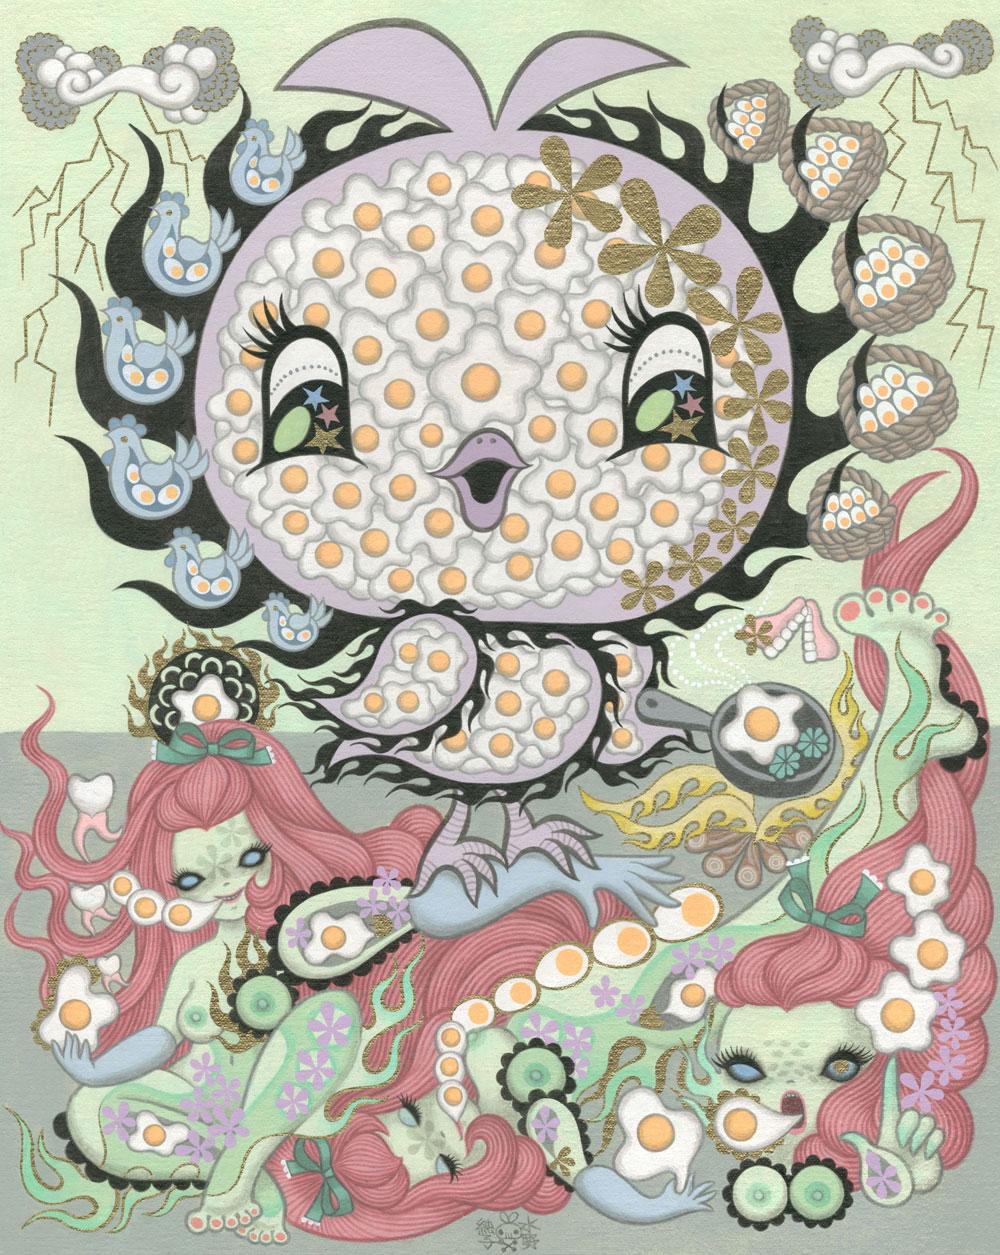 Junko MizunoEggs, 2015Acrylic on canvas 16 x 20 in.